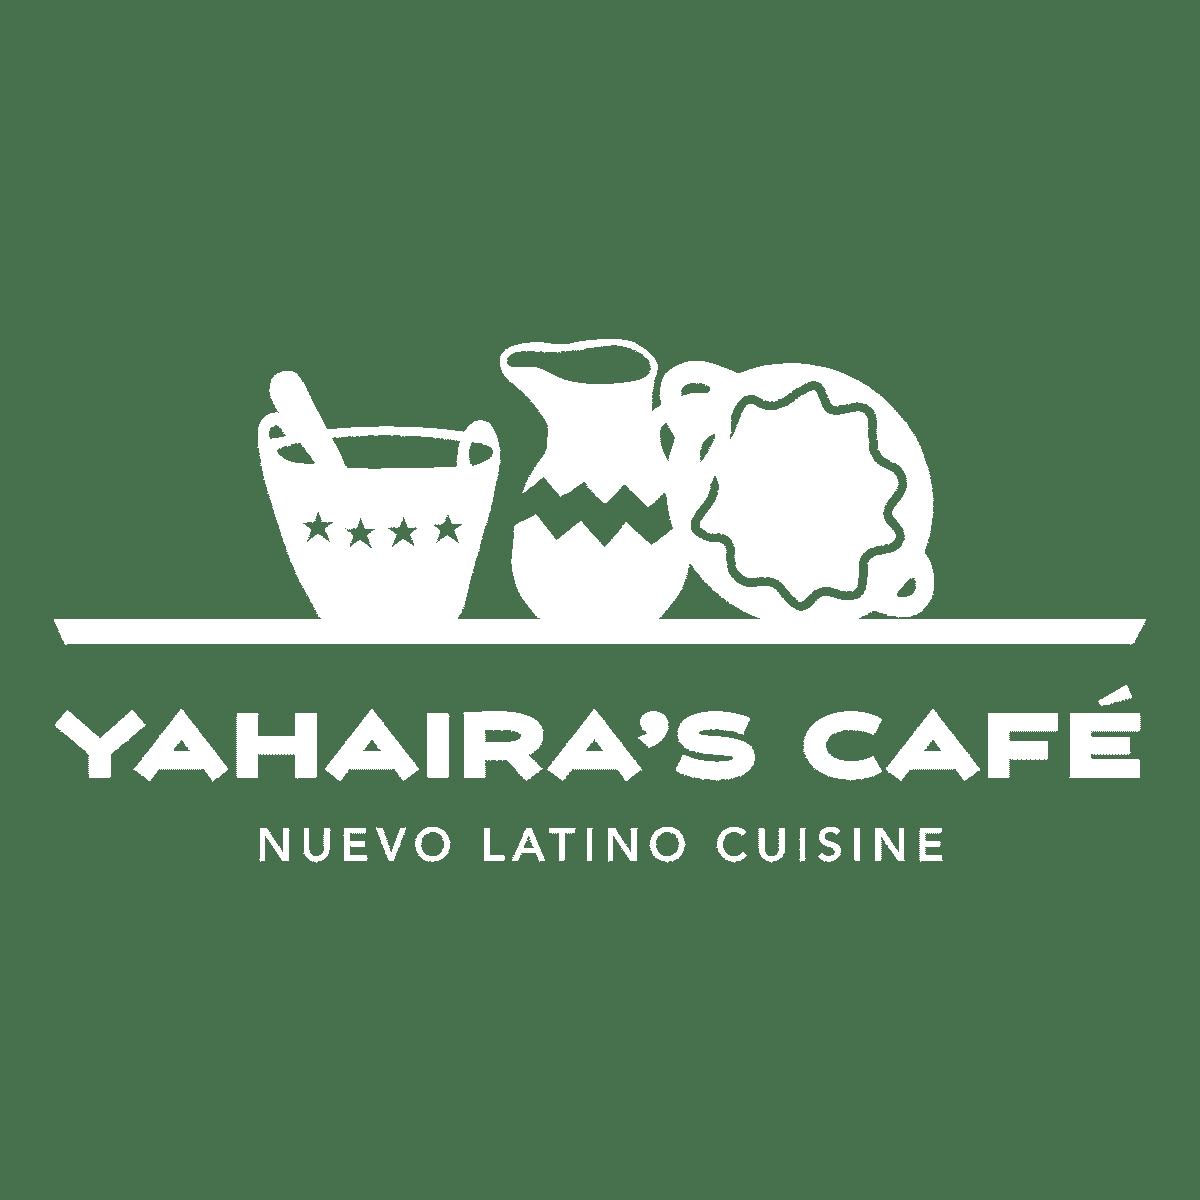 Yahira's Cafe